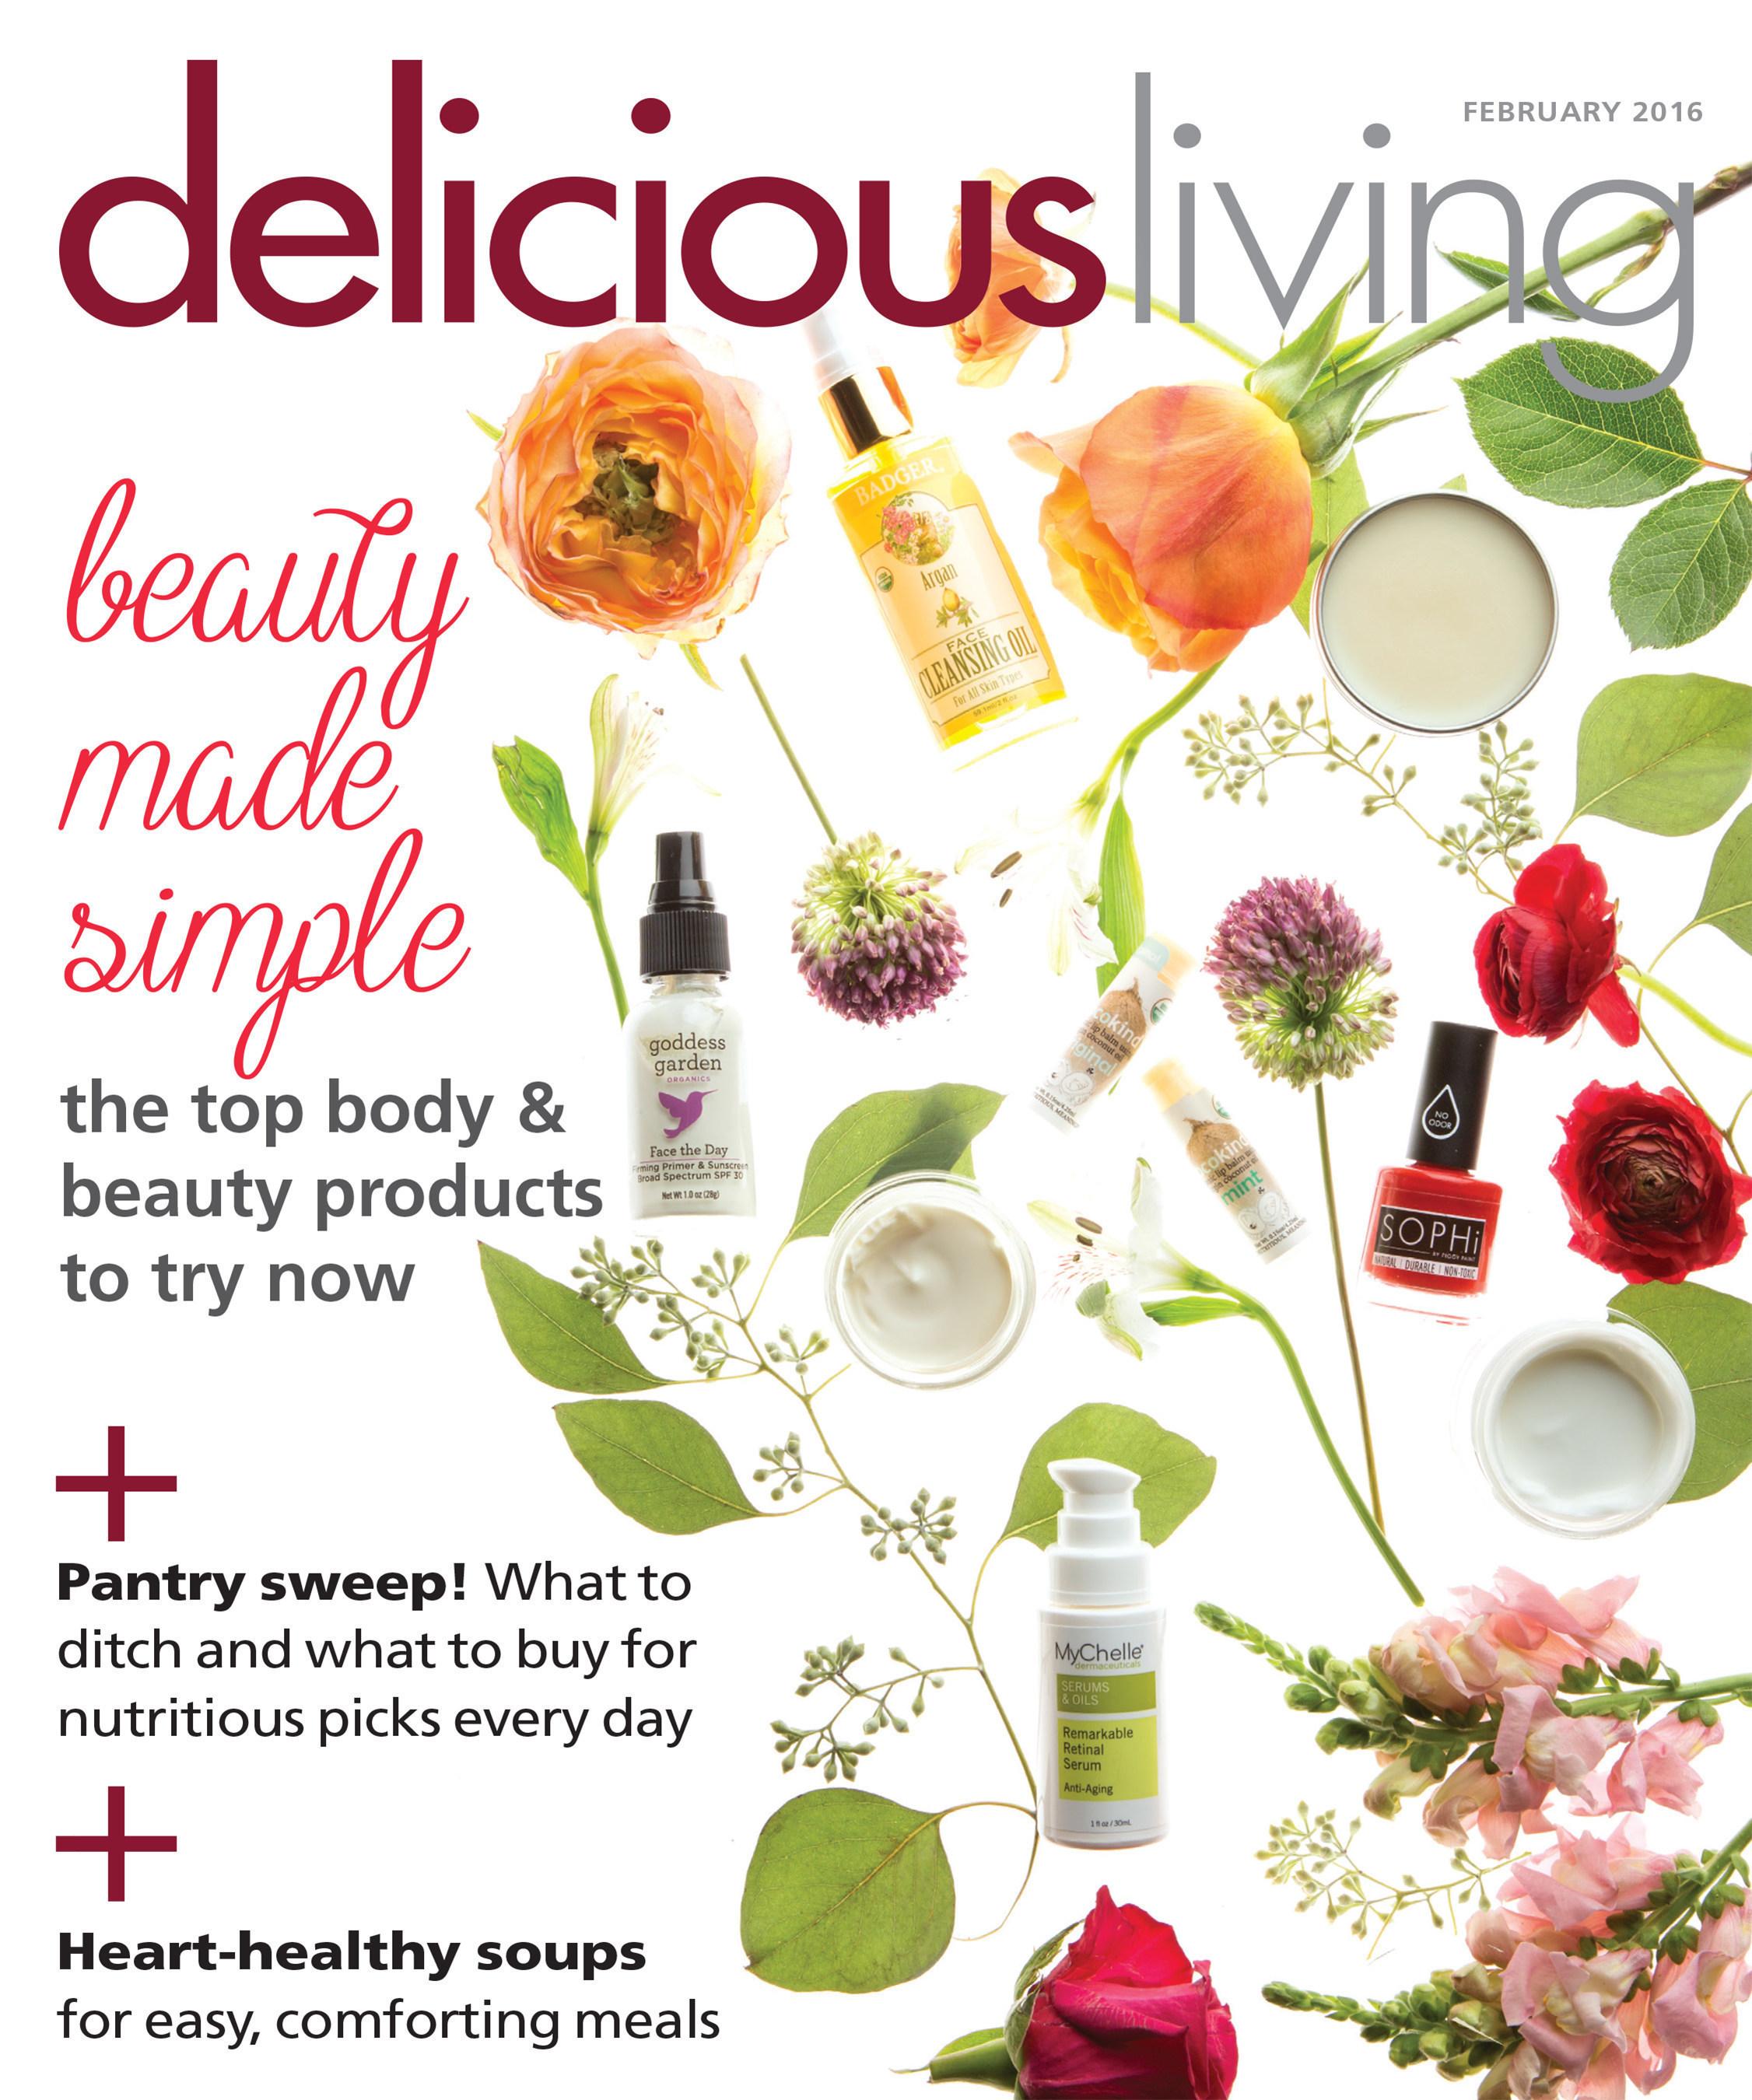 Delicious Living Magazine Announces 2016 Beauty & Body Award Winners